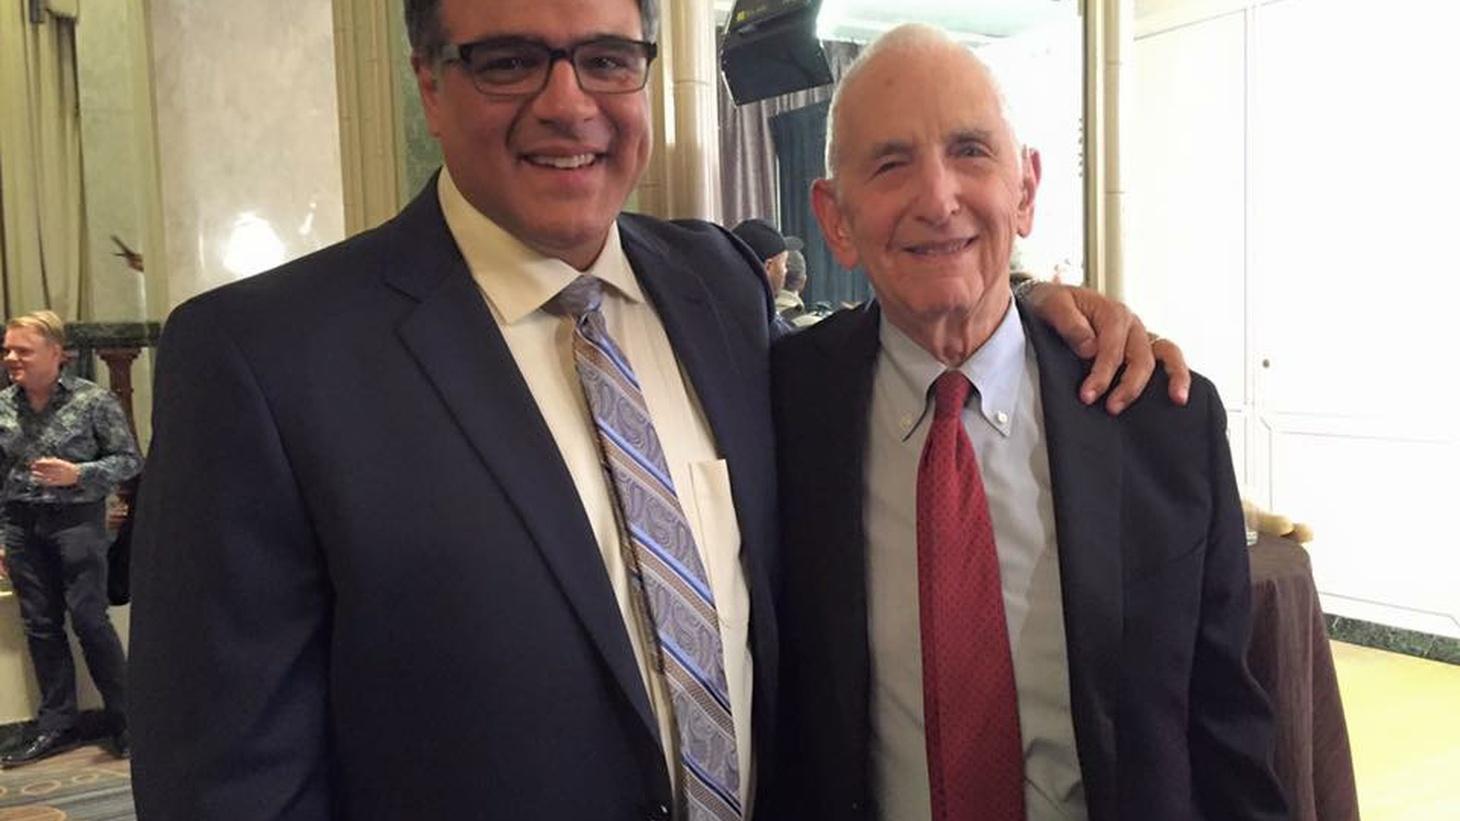 Robert Scheer sits down with former CIA agent and torture whistleblower John Kiriakou.